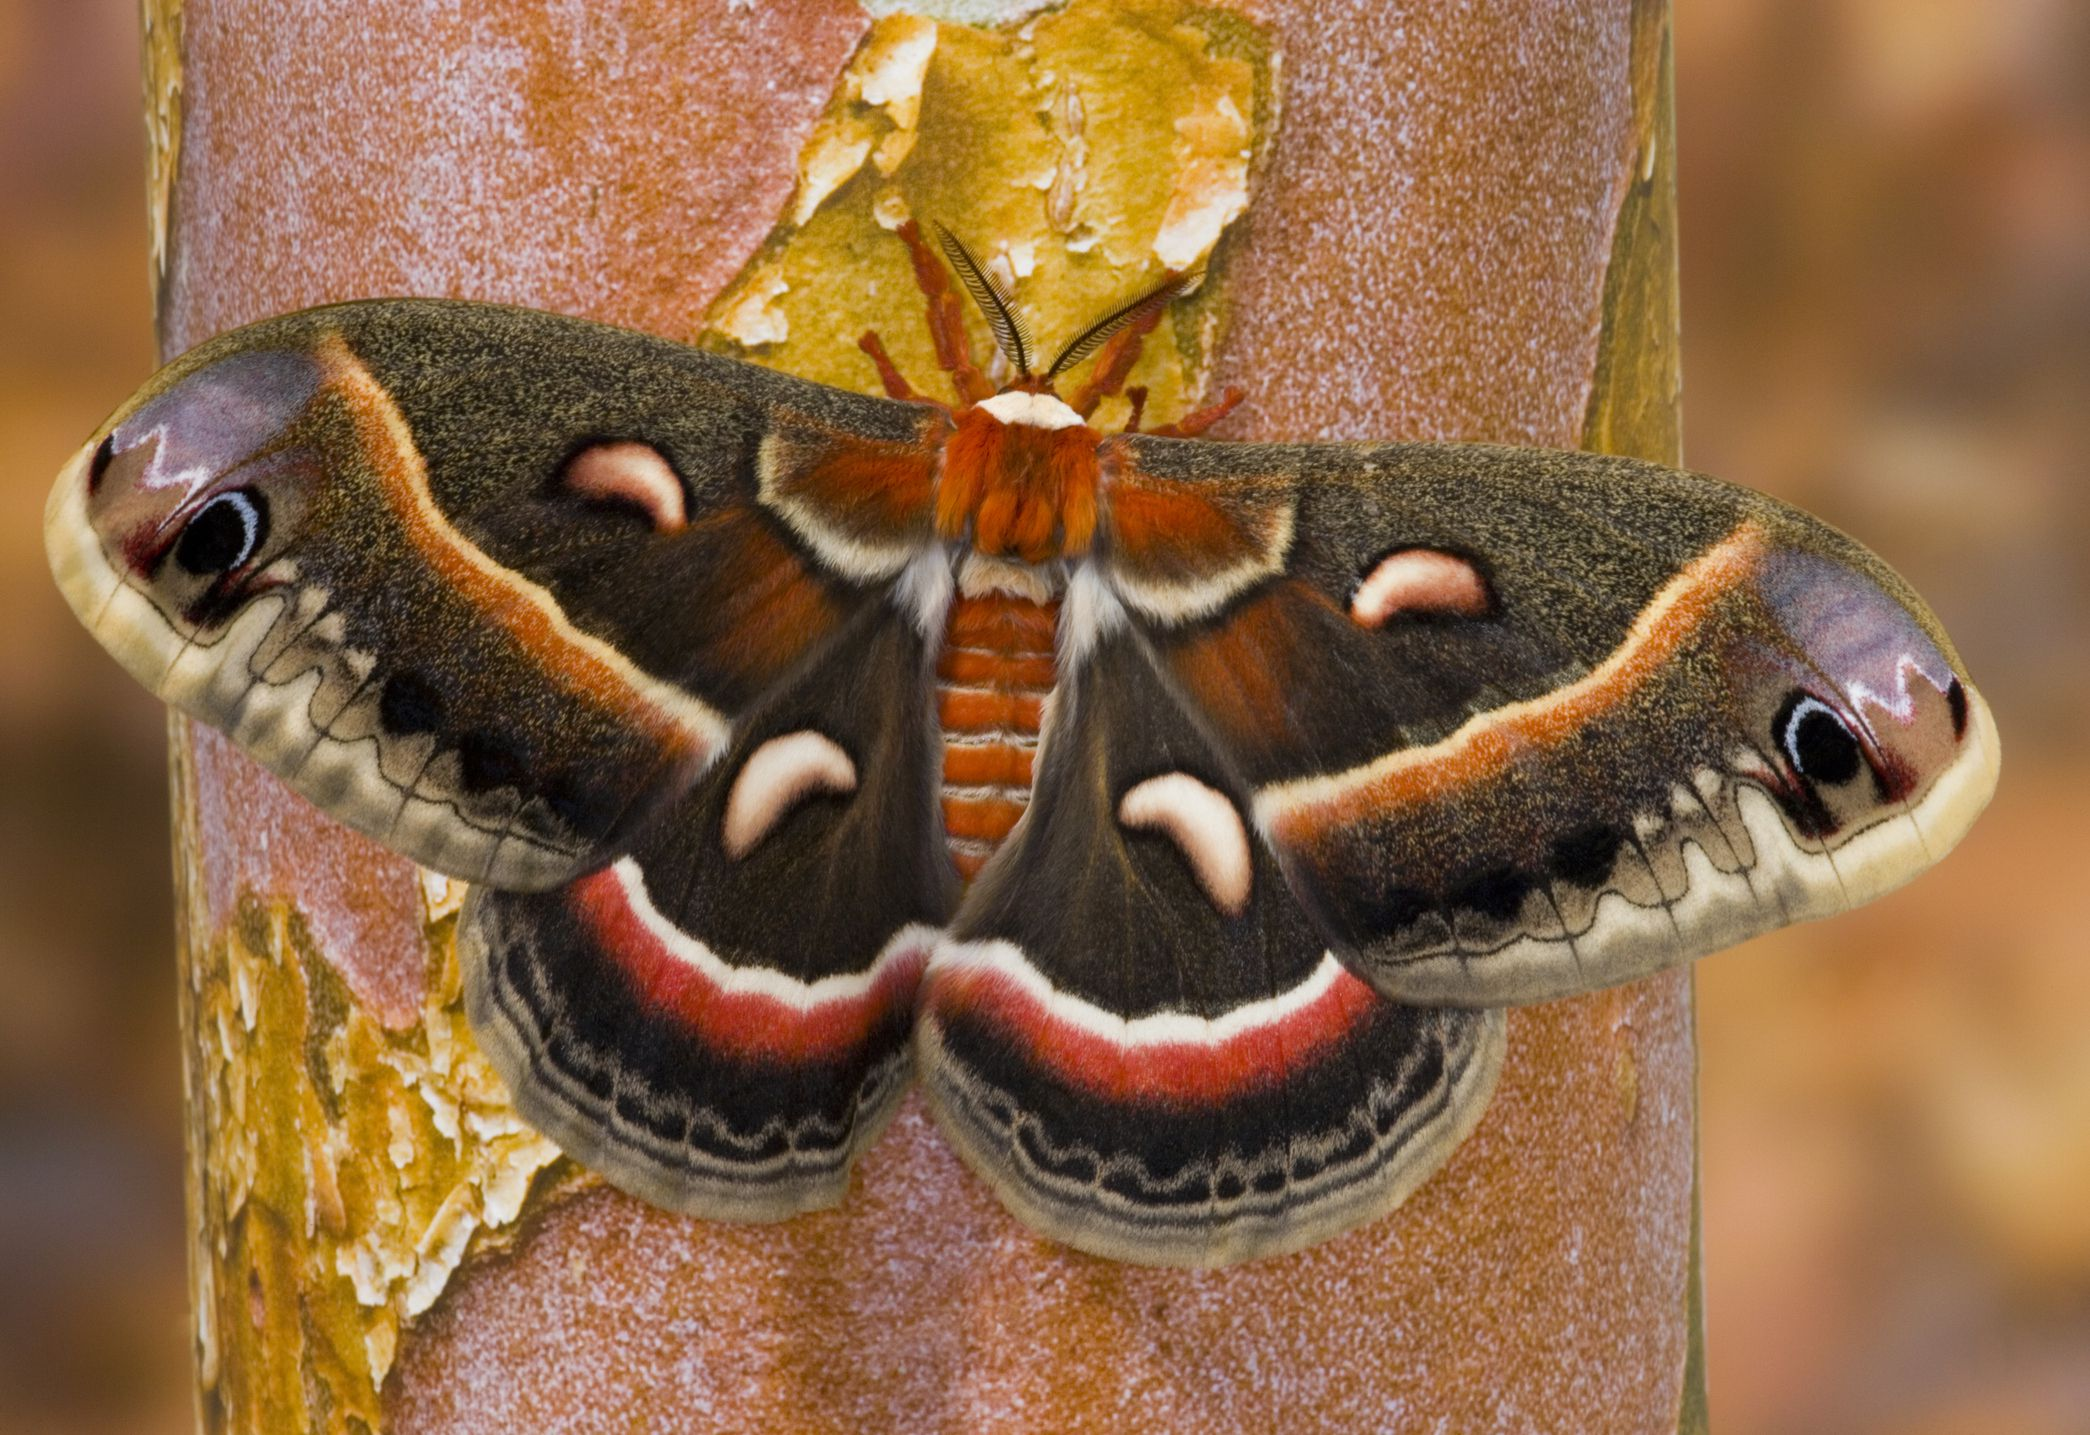 Characteristics of Giant Silkworm Moths and Royal Moths